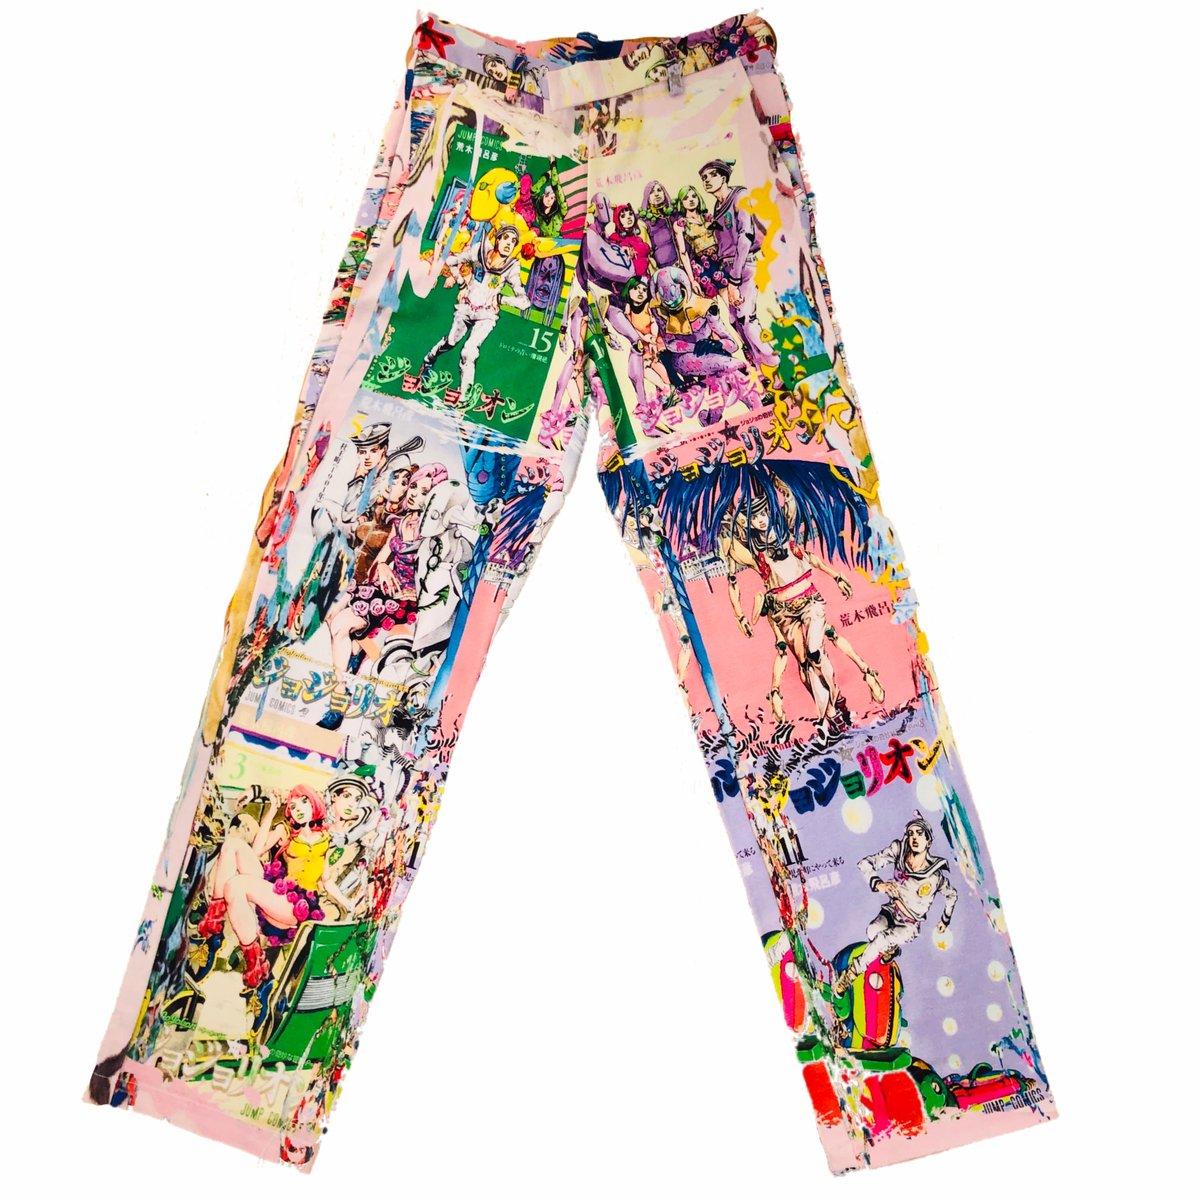 Image of JoJolion Pants